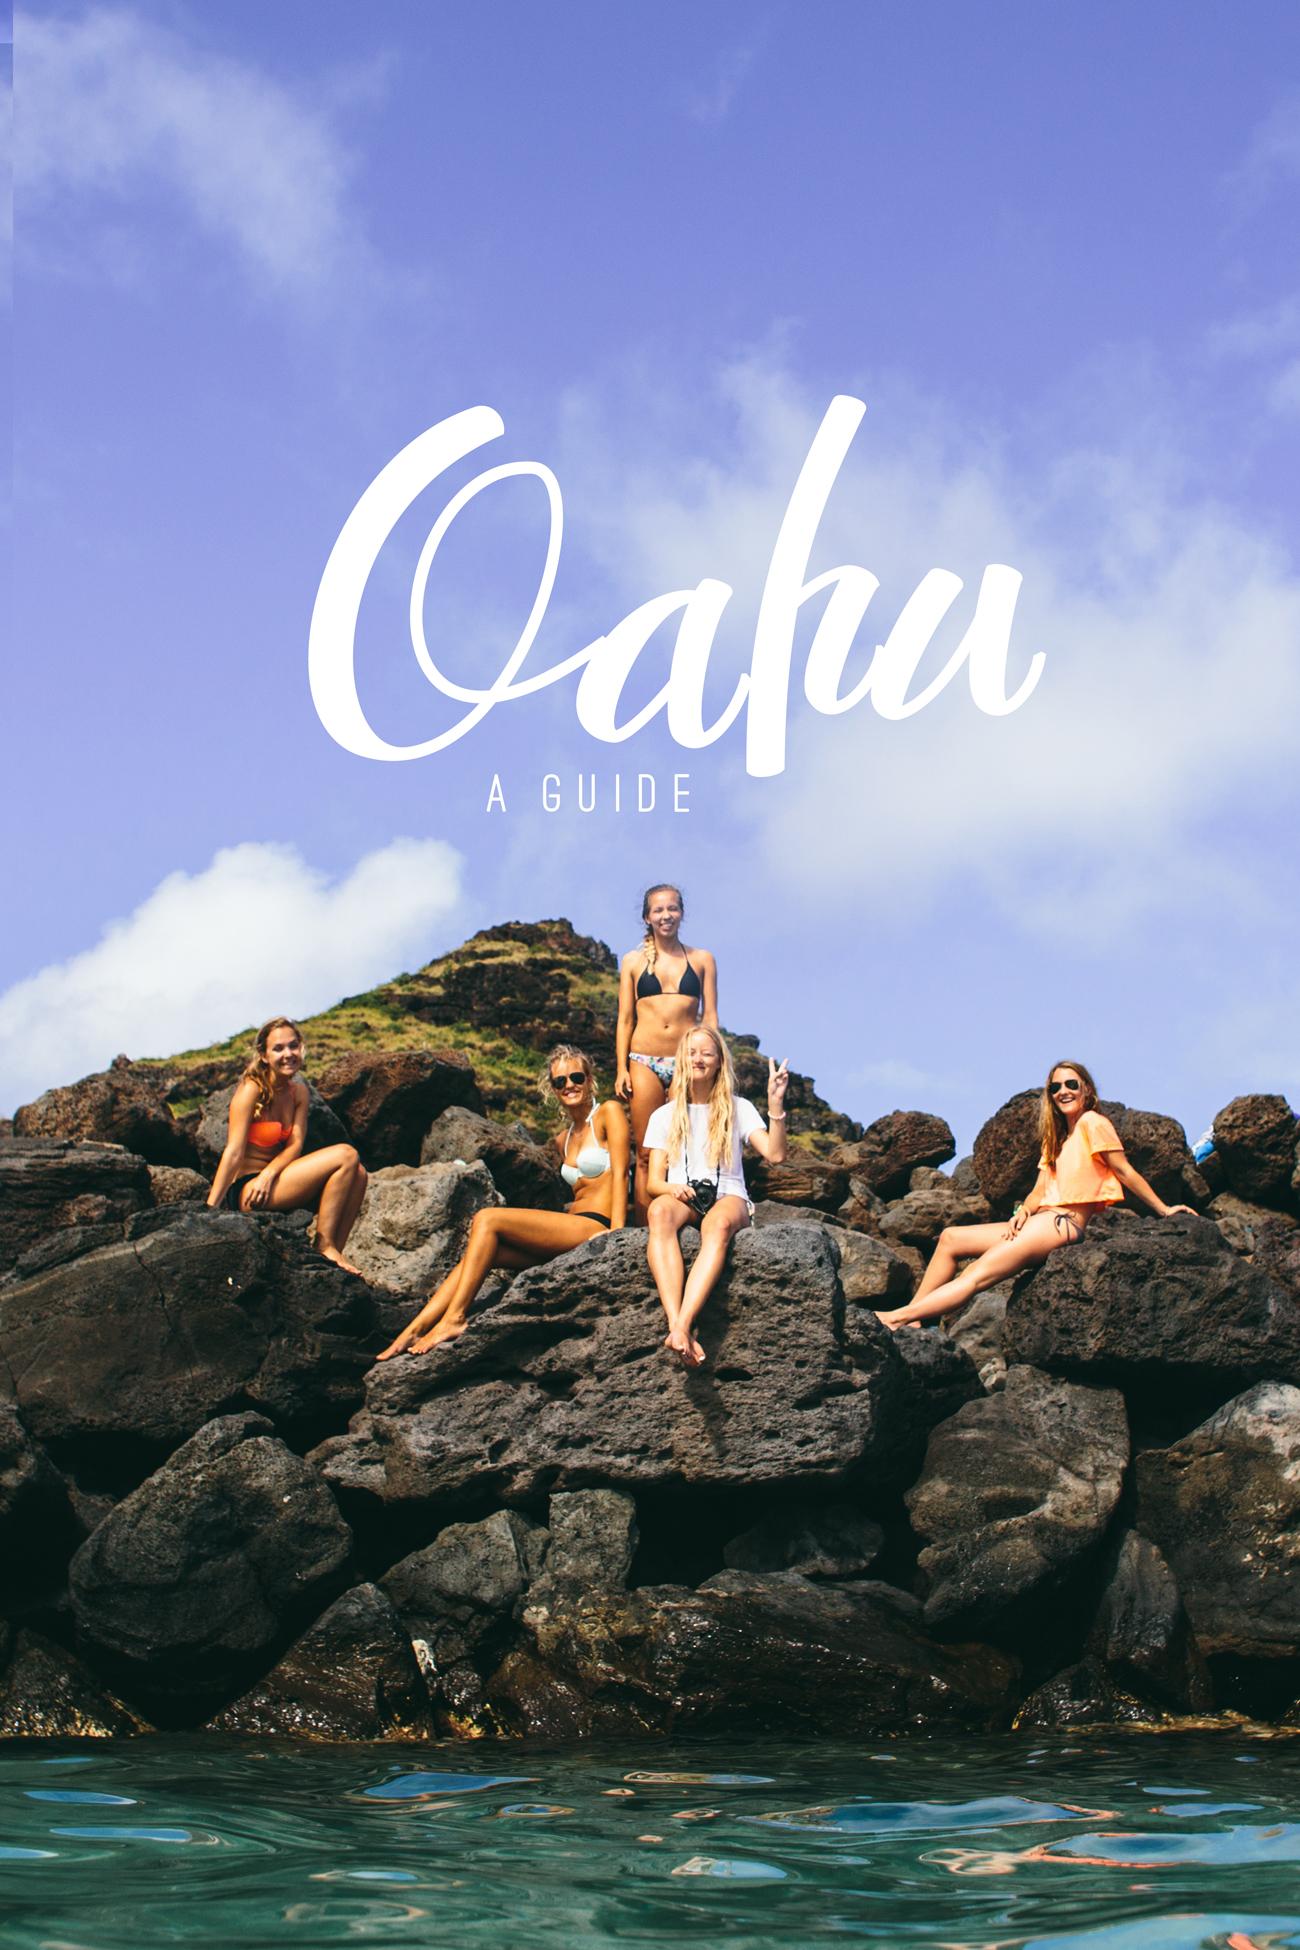 oahu-guide